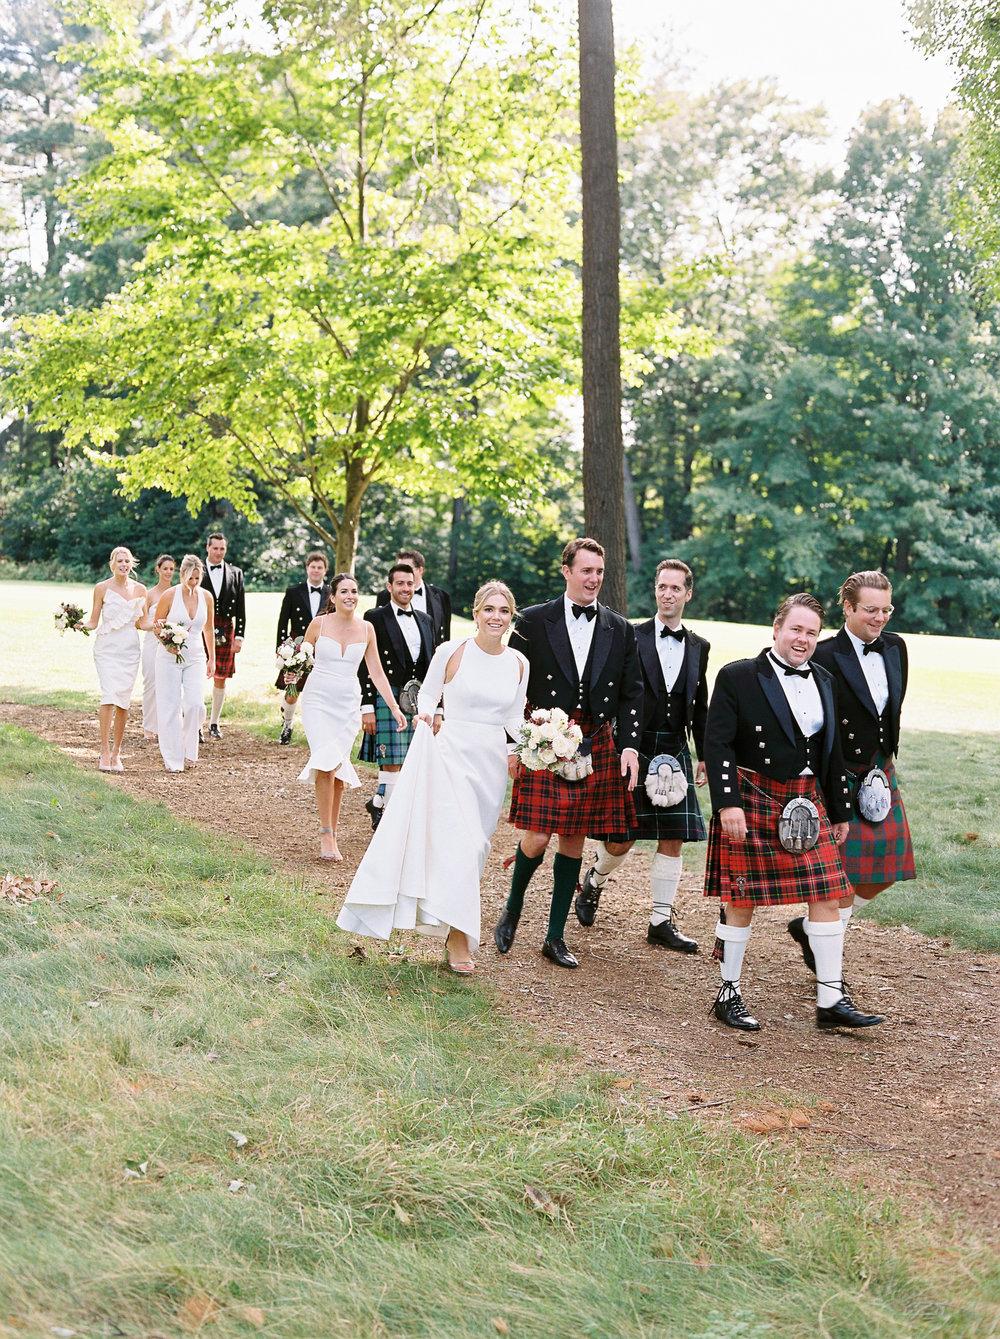 0192-Geneva-Ian-Wedding-Toronto Golf Club-When He Found Her-TorontoPhotographer.jpg